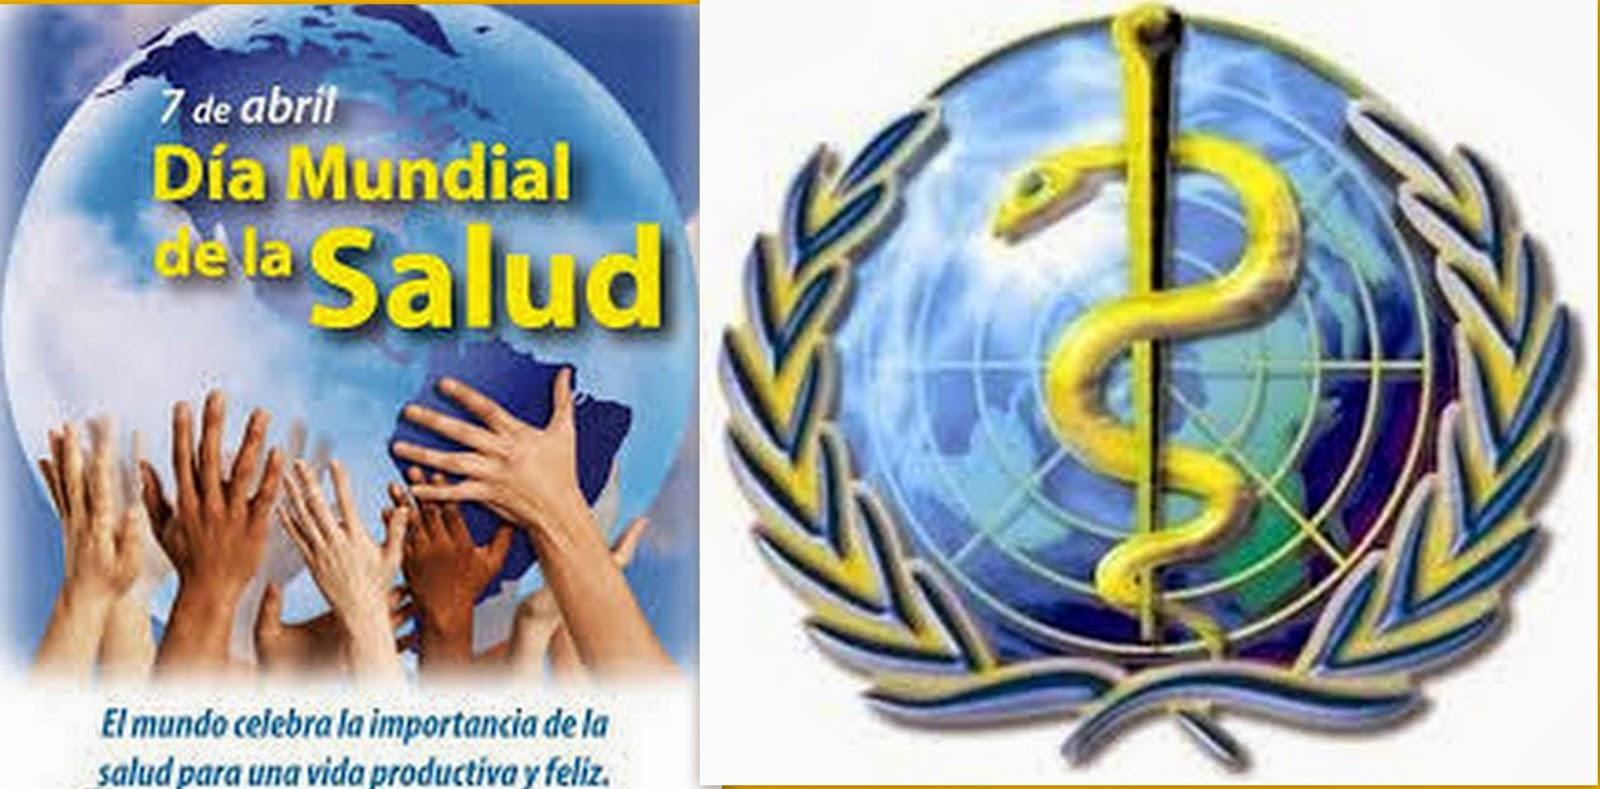 Jaitt Odonto Social 7 De ABRIL U0026quot DIA MUNDIAL DE LA SALUD